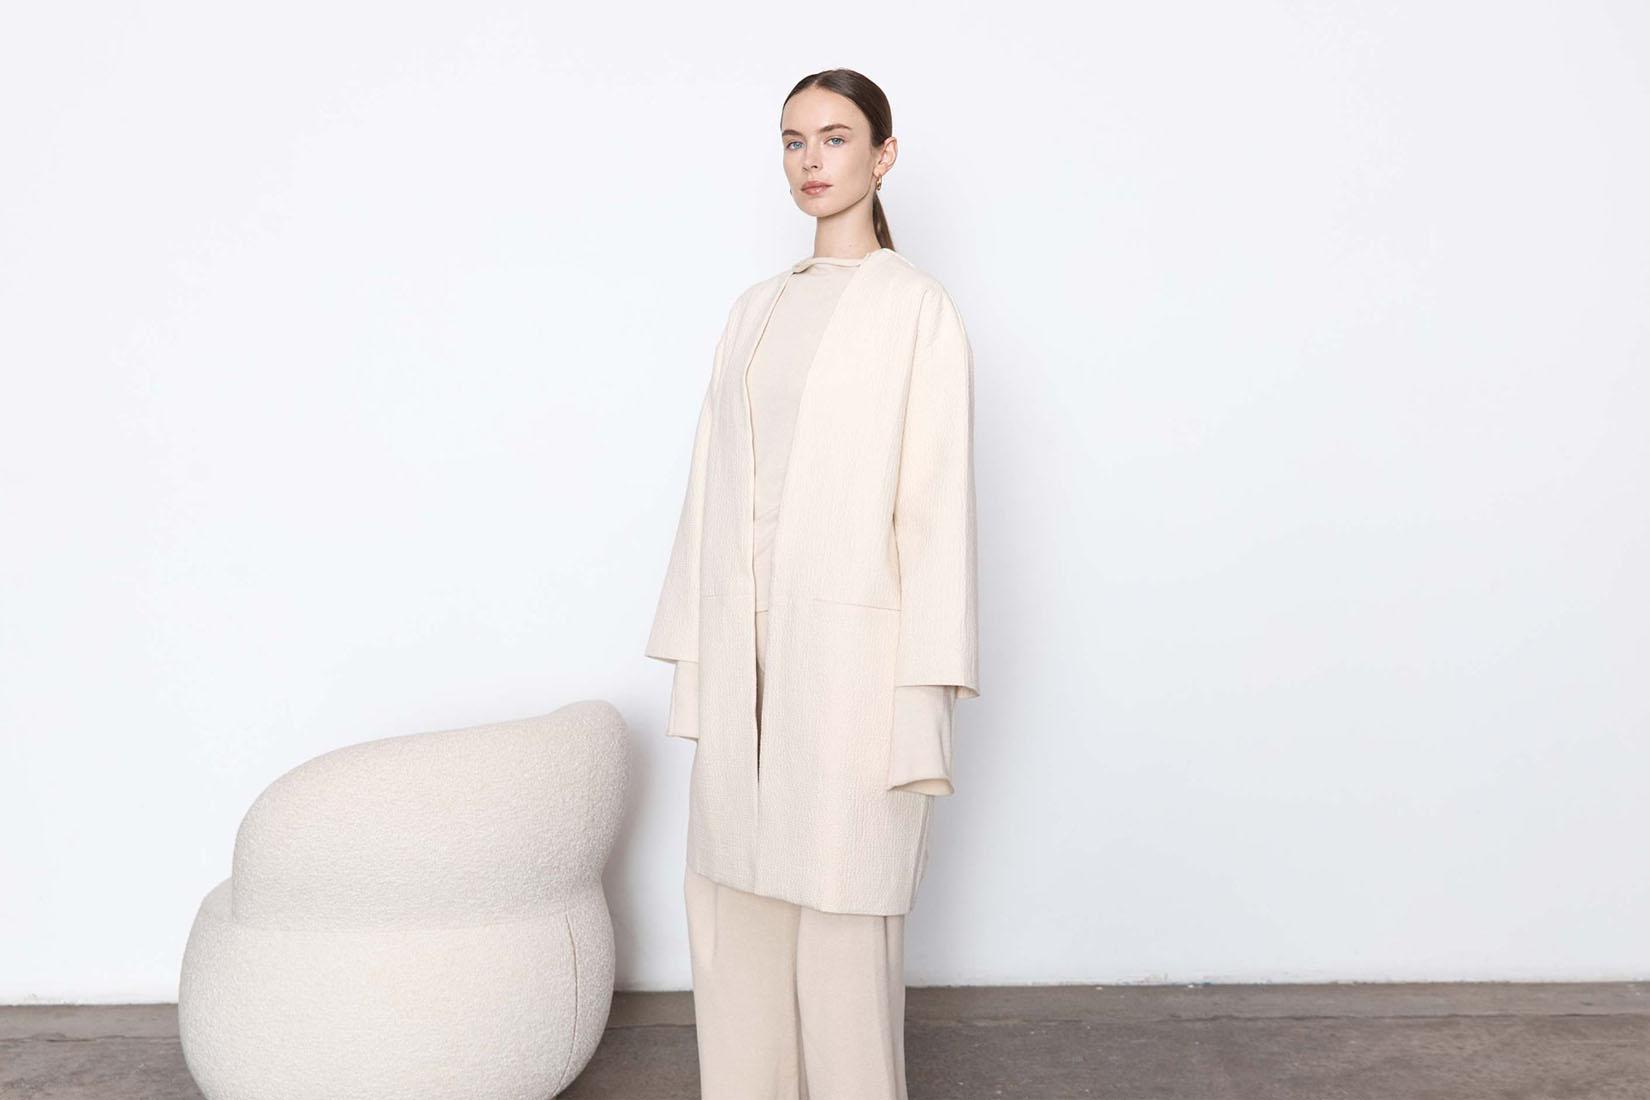 best loungewear brands women st agni review Luxe Digital